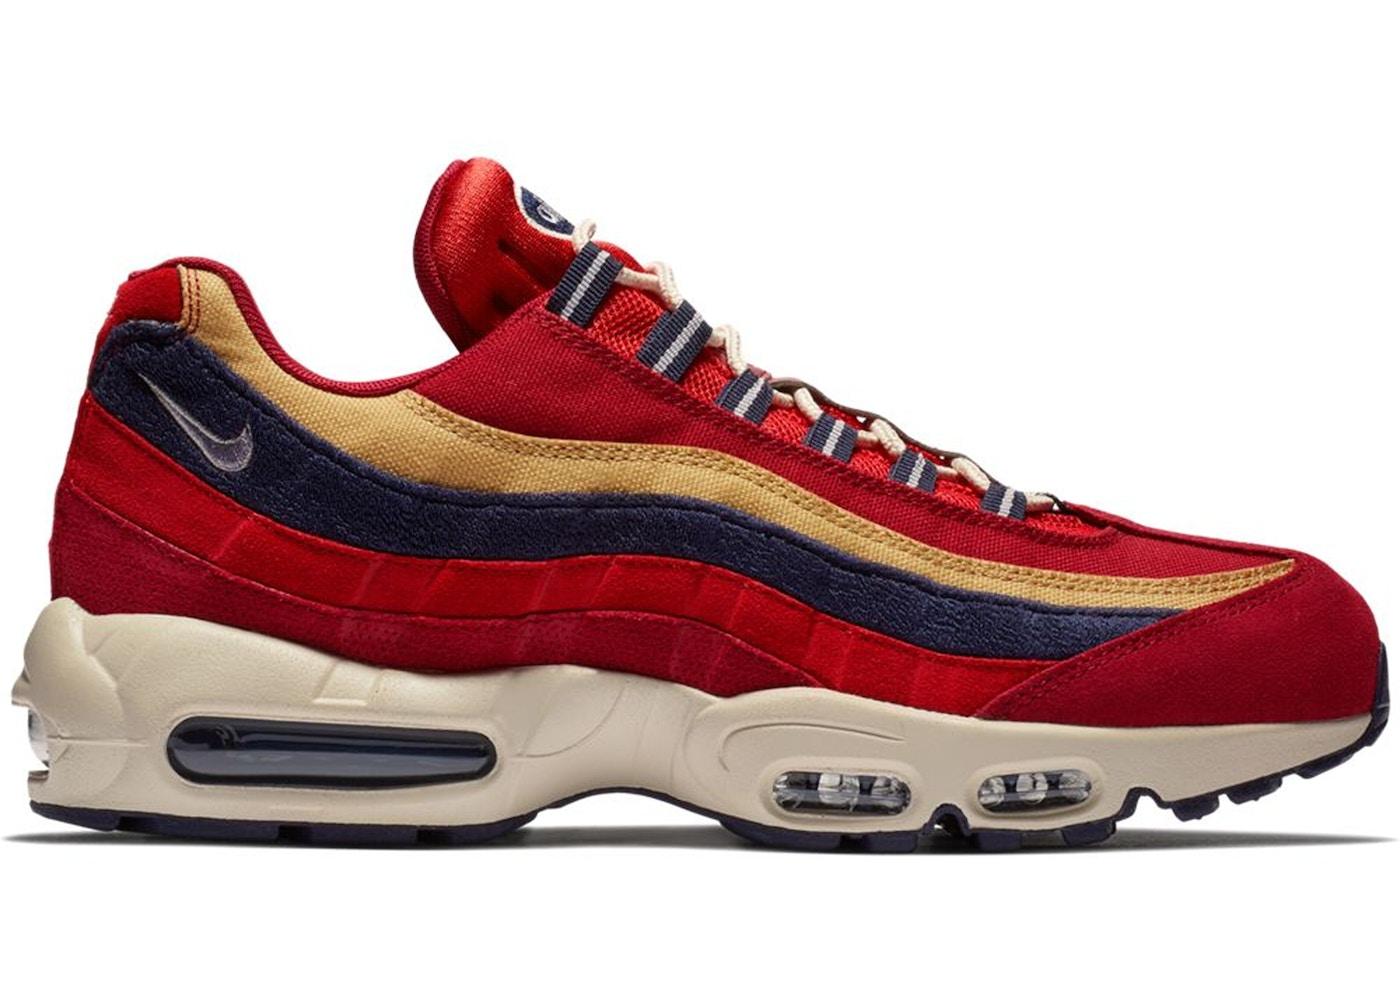 Nike Air Max 95 Red Crush Wheat Gold 538416 603